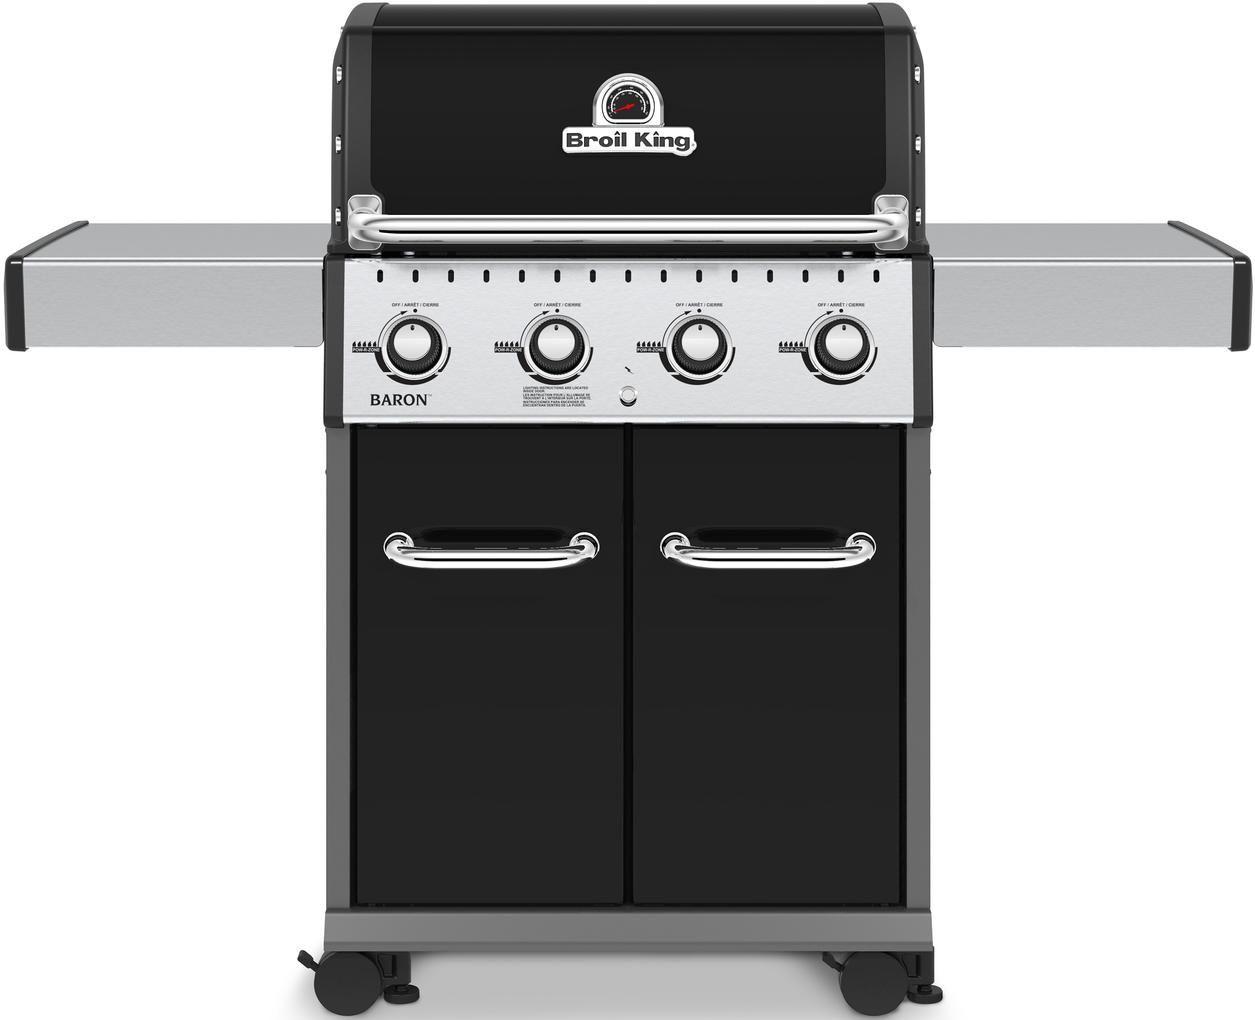 Outdoor Cooking Appliances, 4K TV's, Furniture, Home Integration